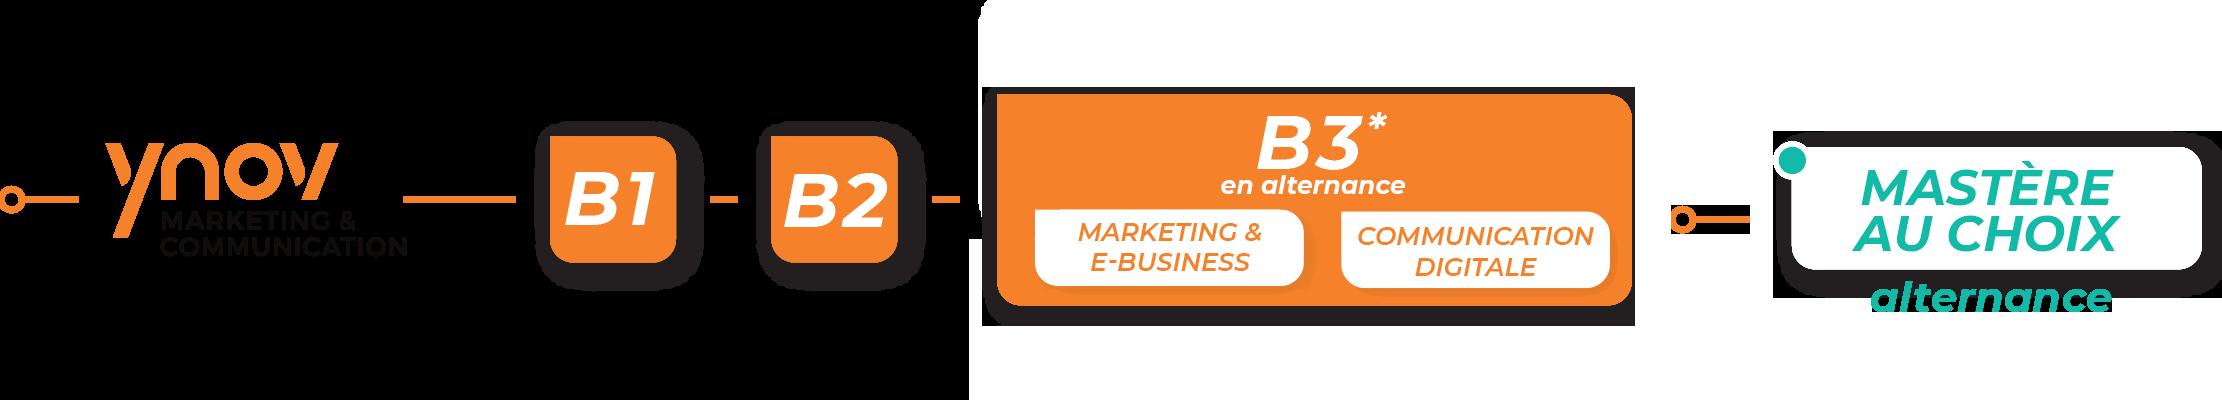 bachelor marketing progression